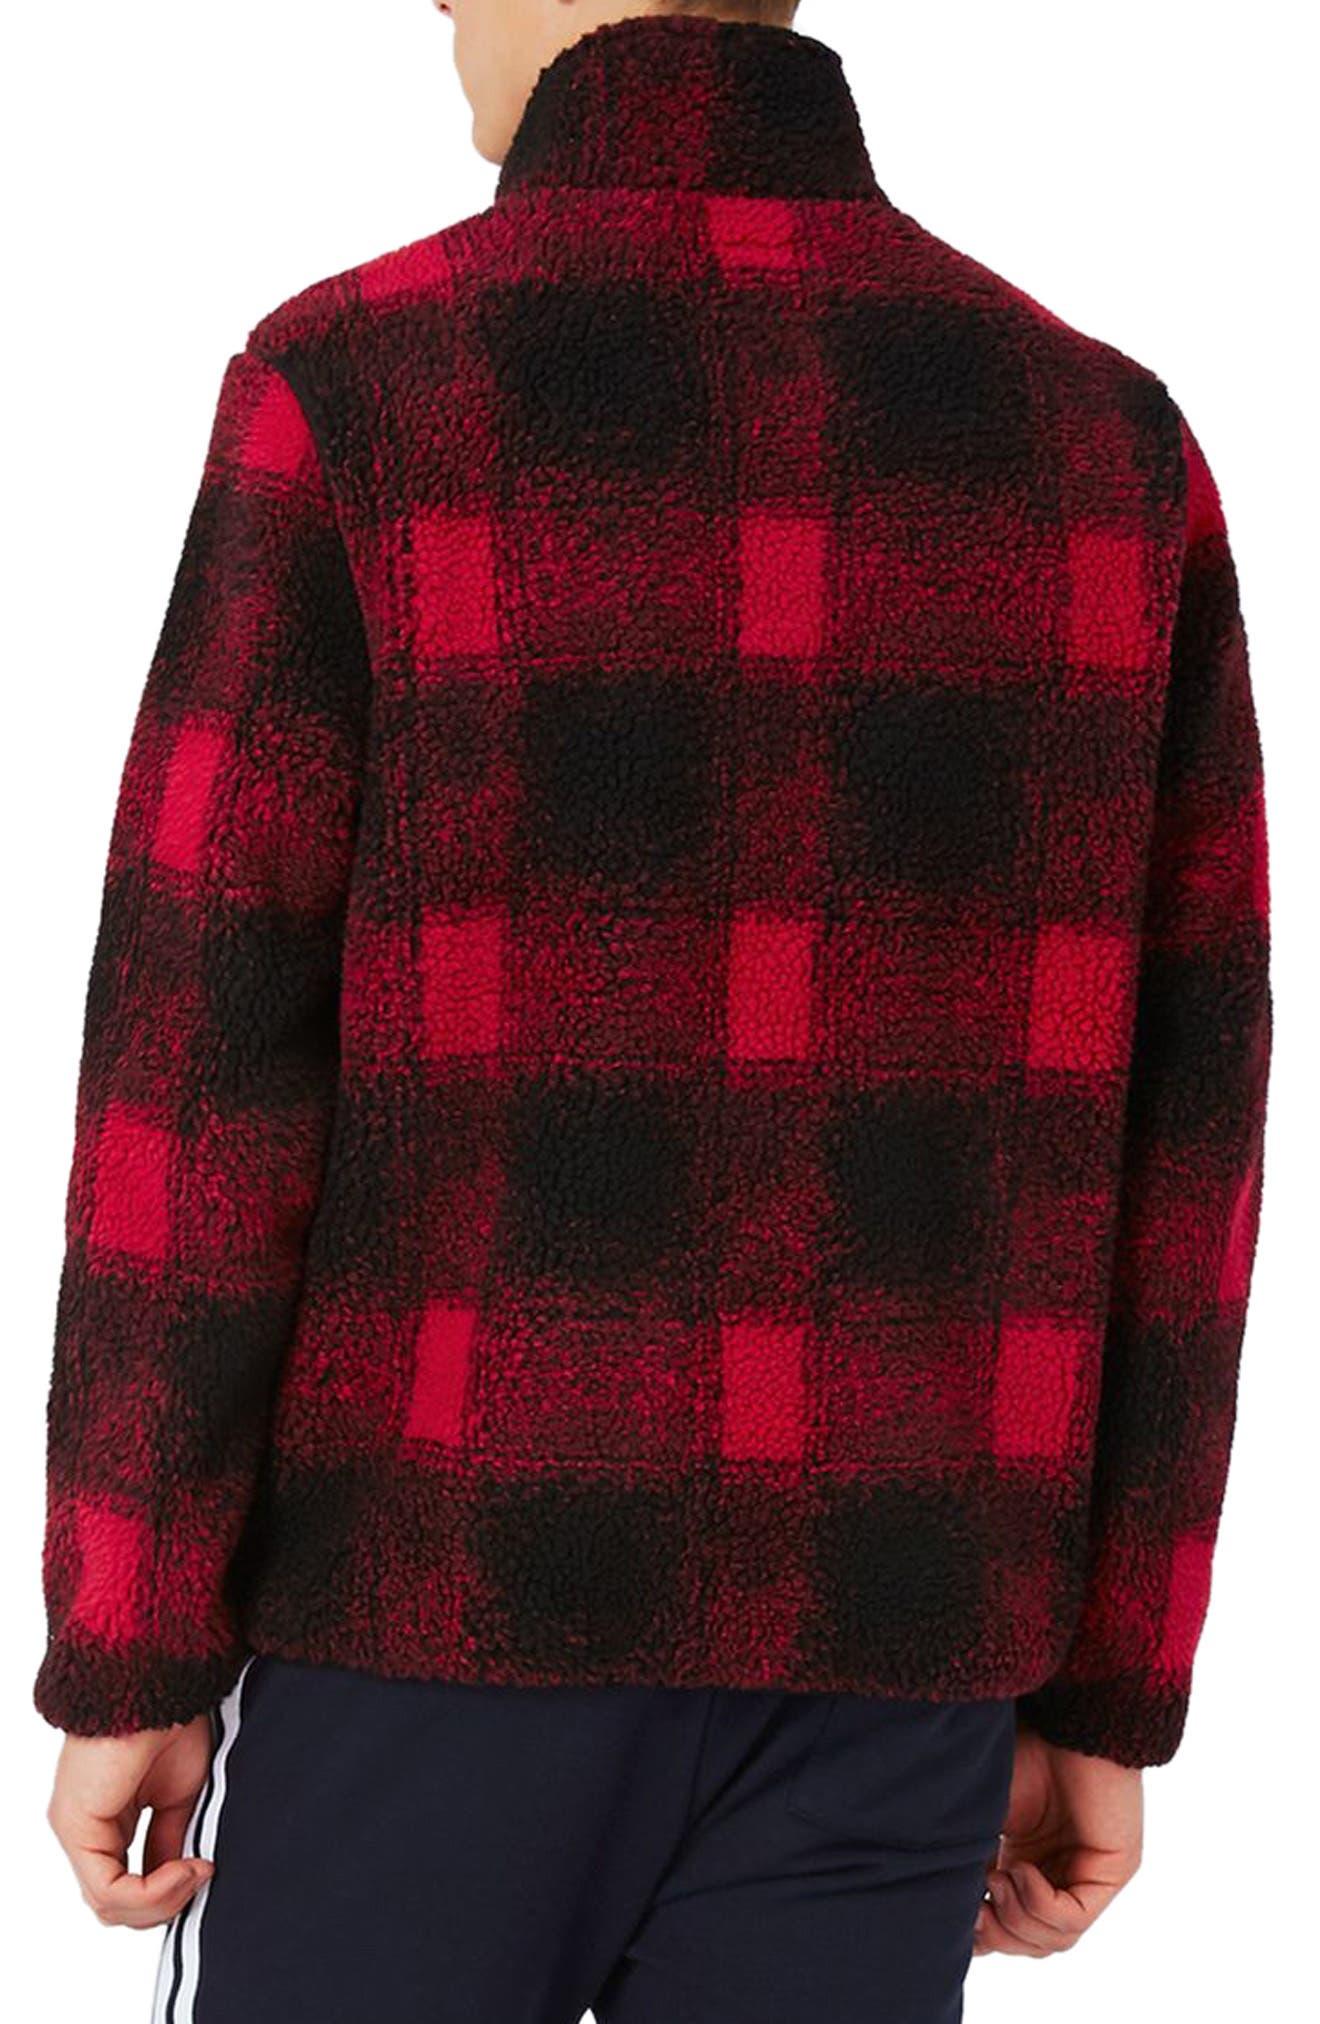 Buffalo Check Borg Jacket,                             Alternate thumbnail 2, color,                             Red Multi